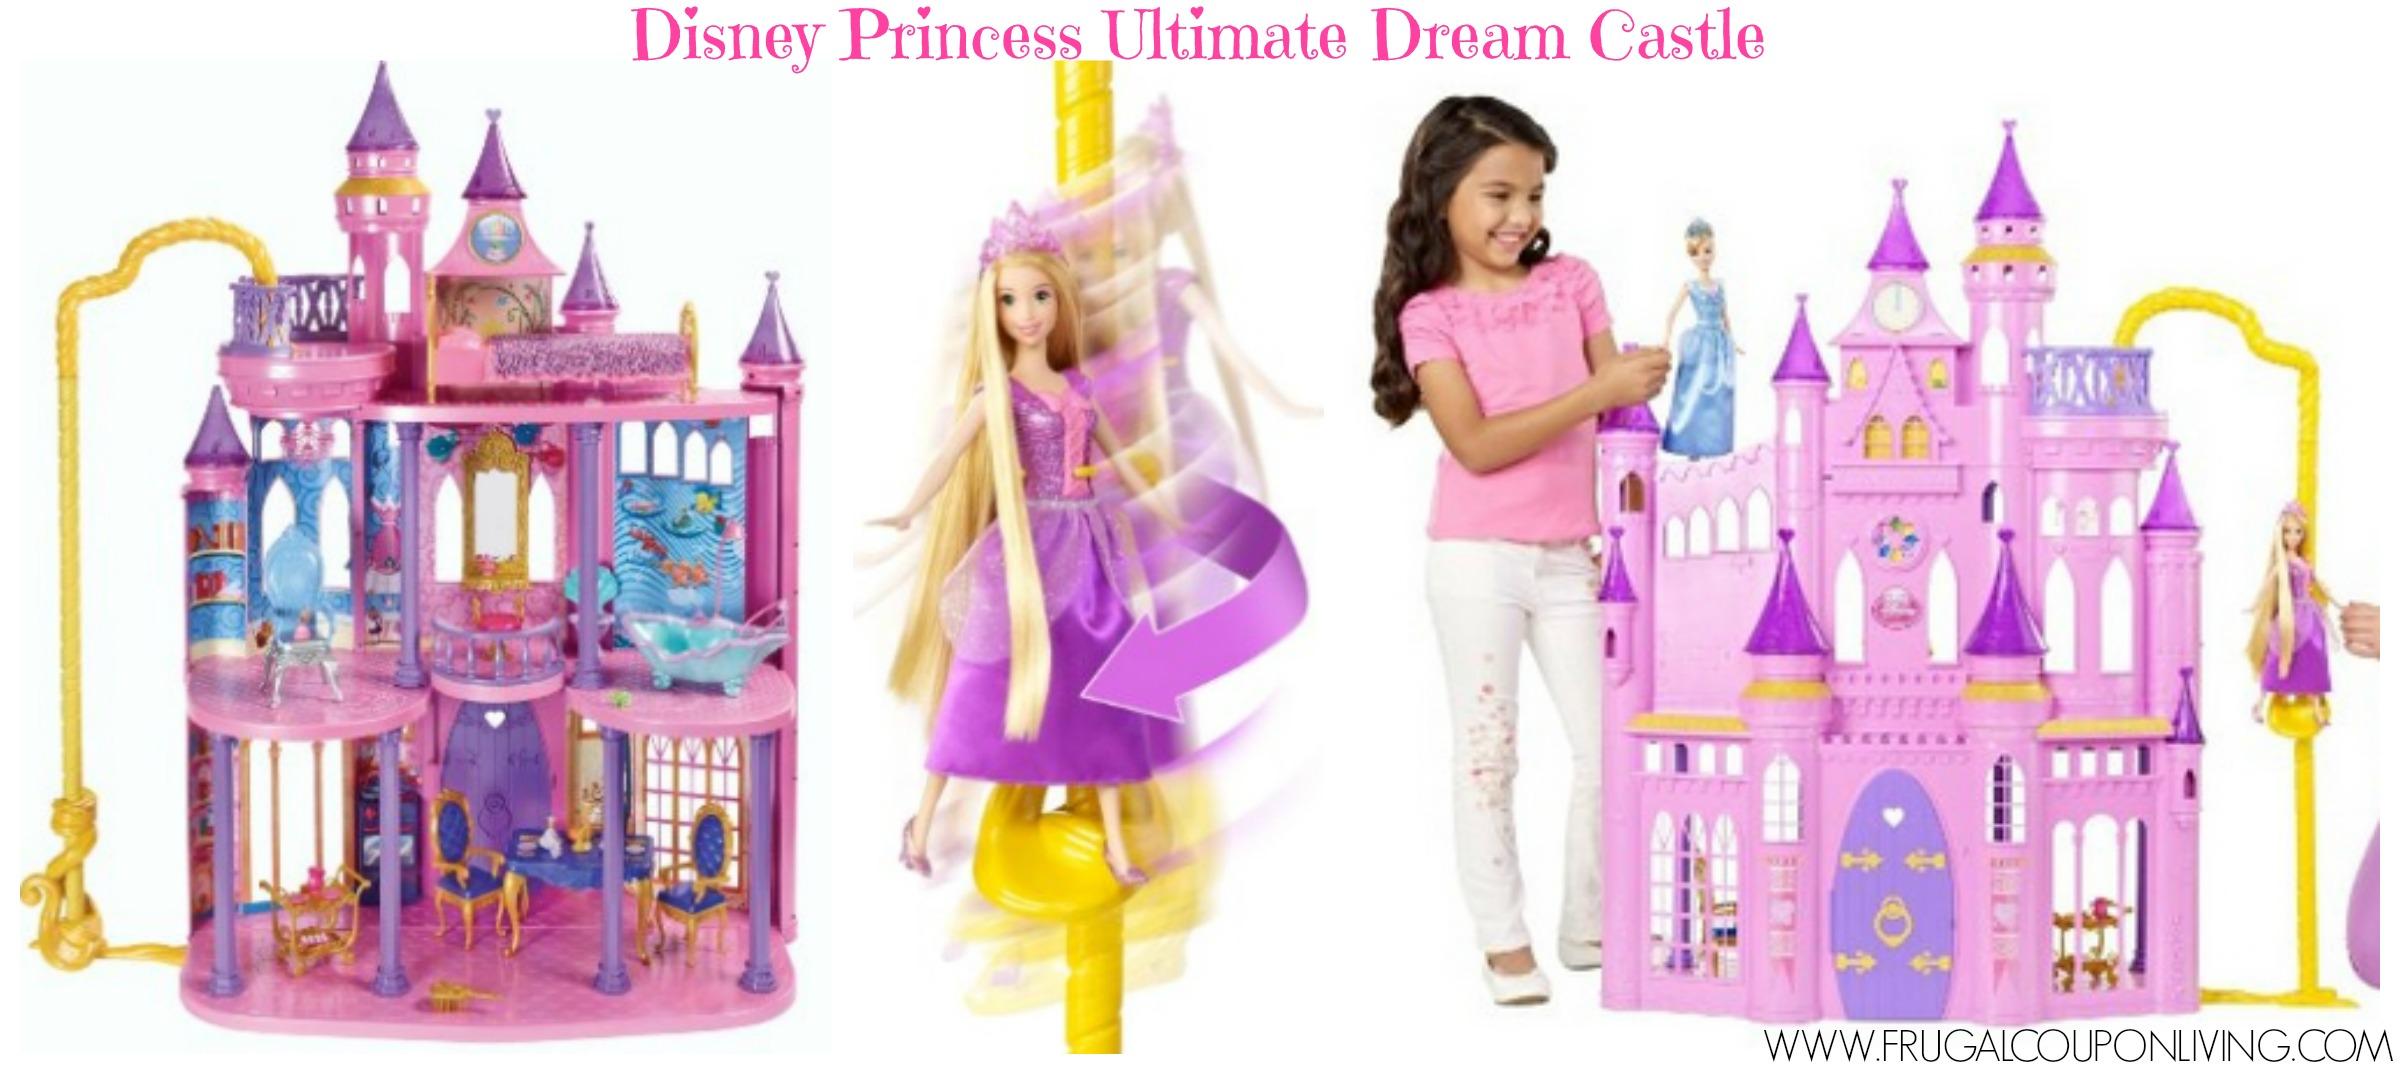 Disney princess quintessential castle coupon